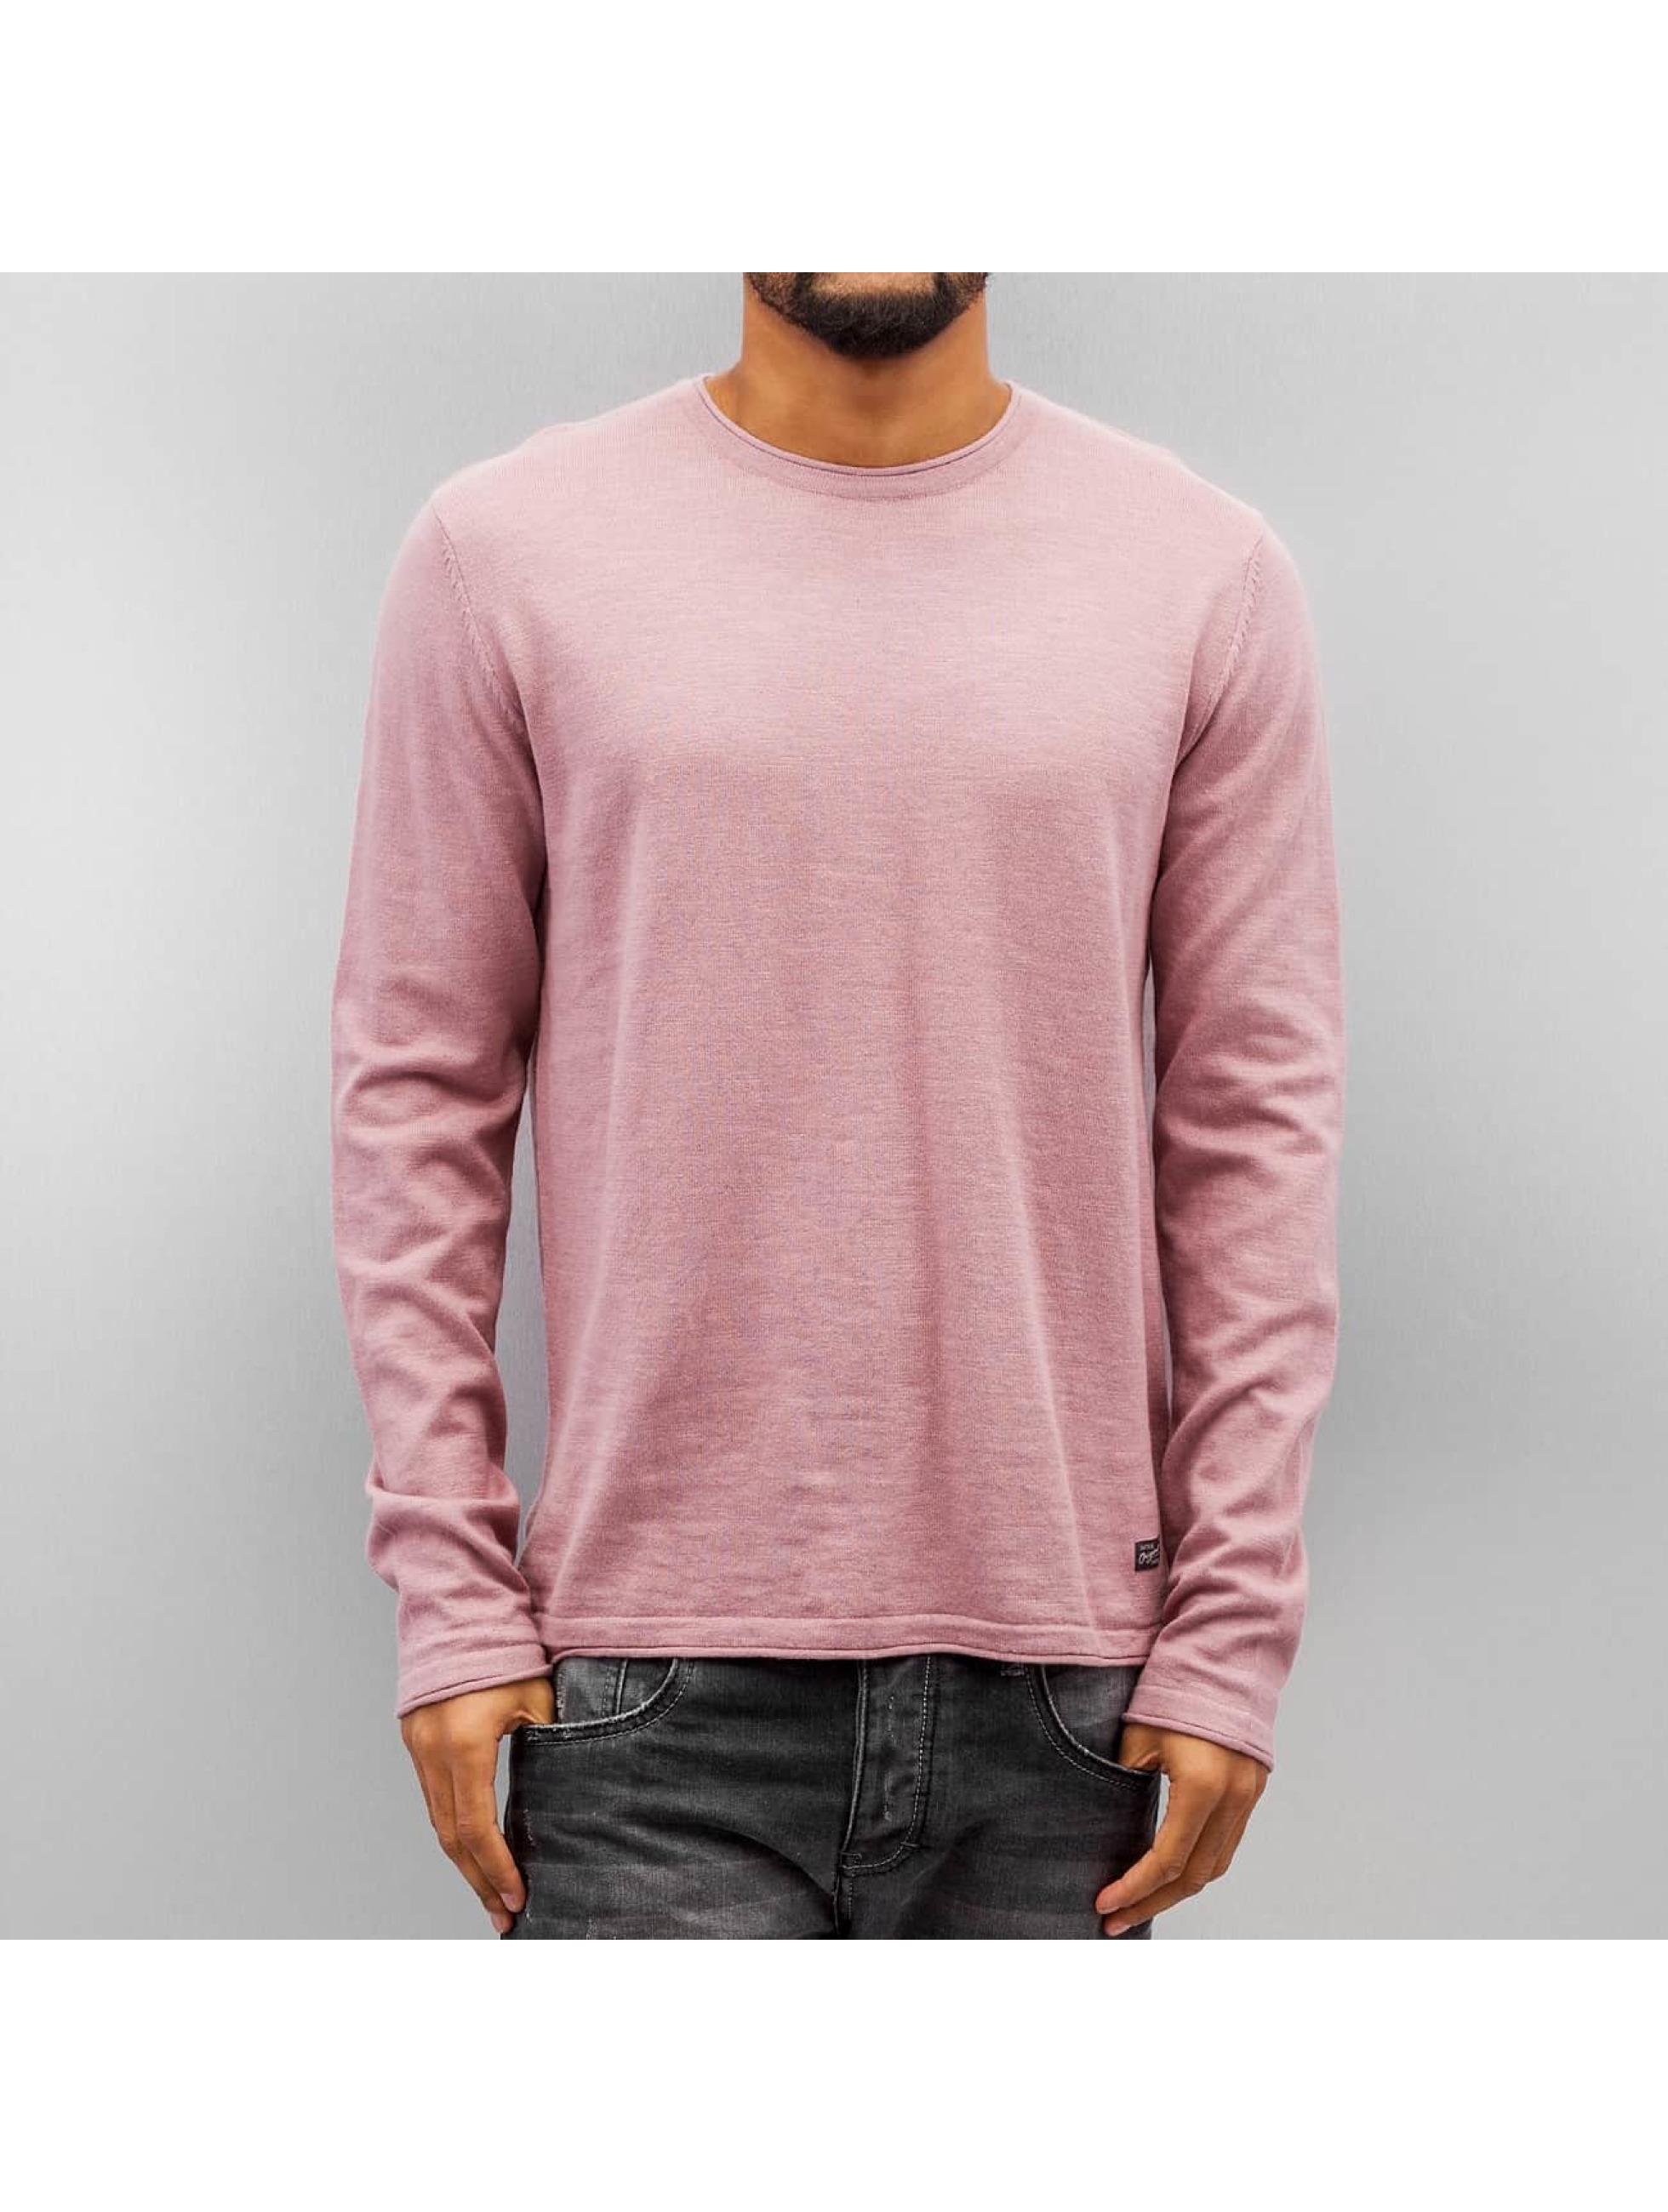 Jack & Jones jorAbner Knit Sweatshirt Deauville Mauve Sale Angebote